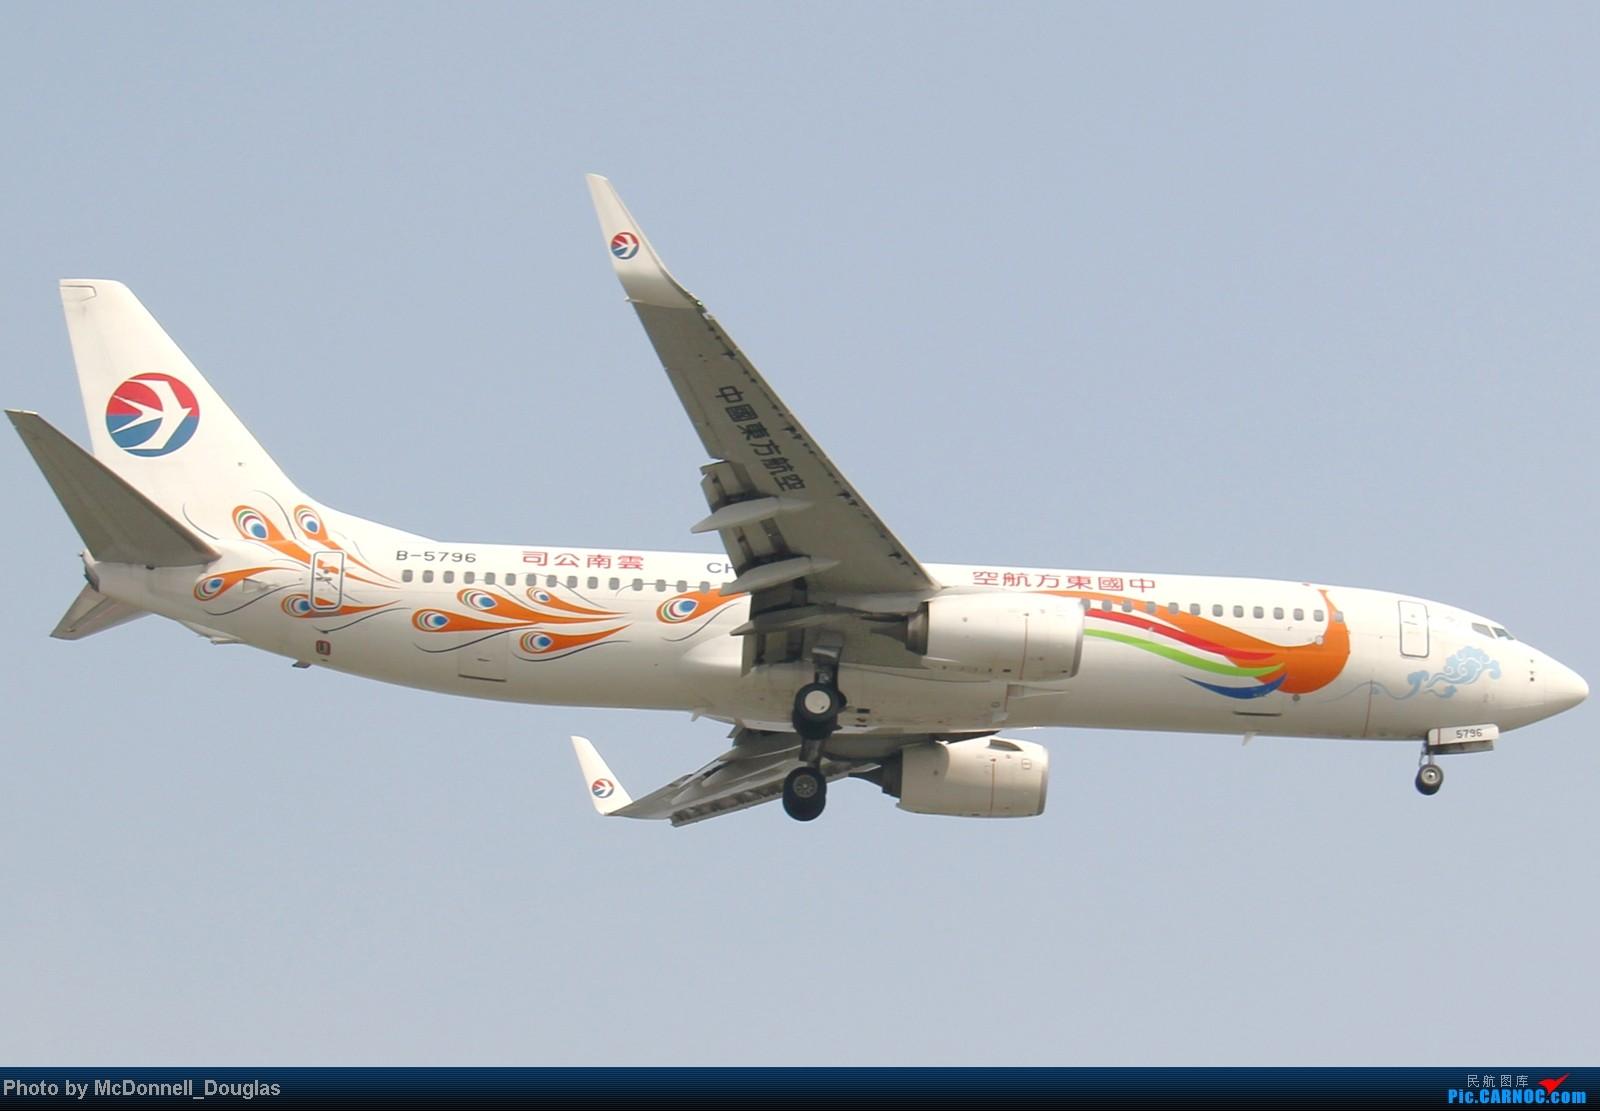 Re:[原创]【上海飞友会】ZSSS杂图一组 BOEING 737-800 B-5796 中国上海虹桥机场